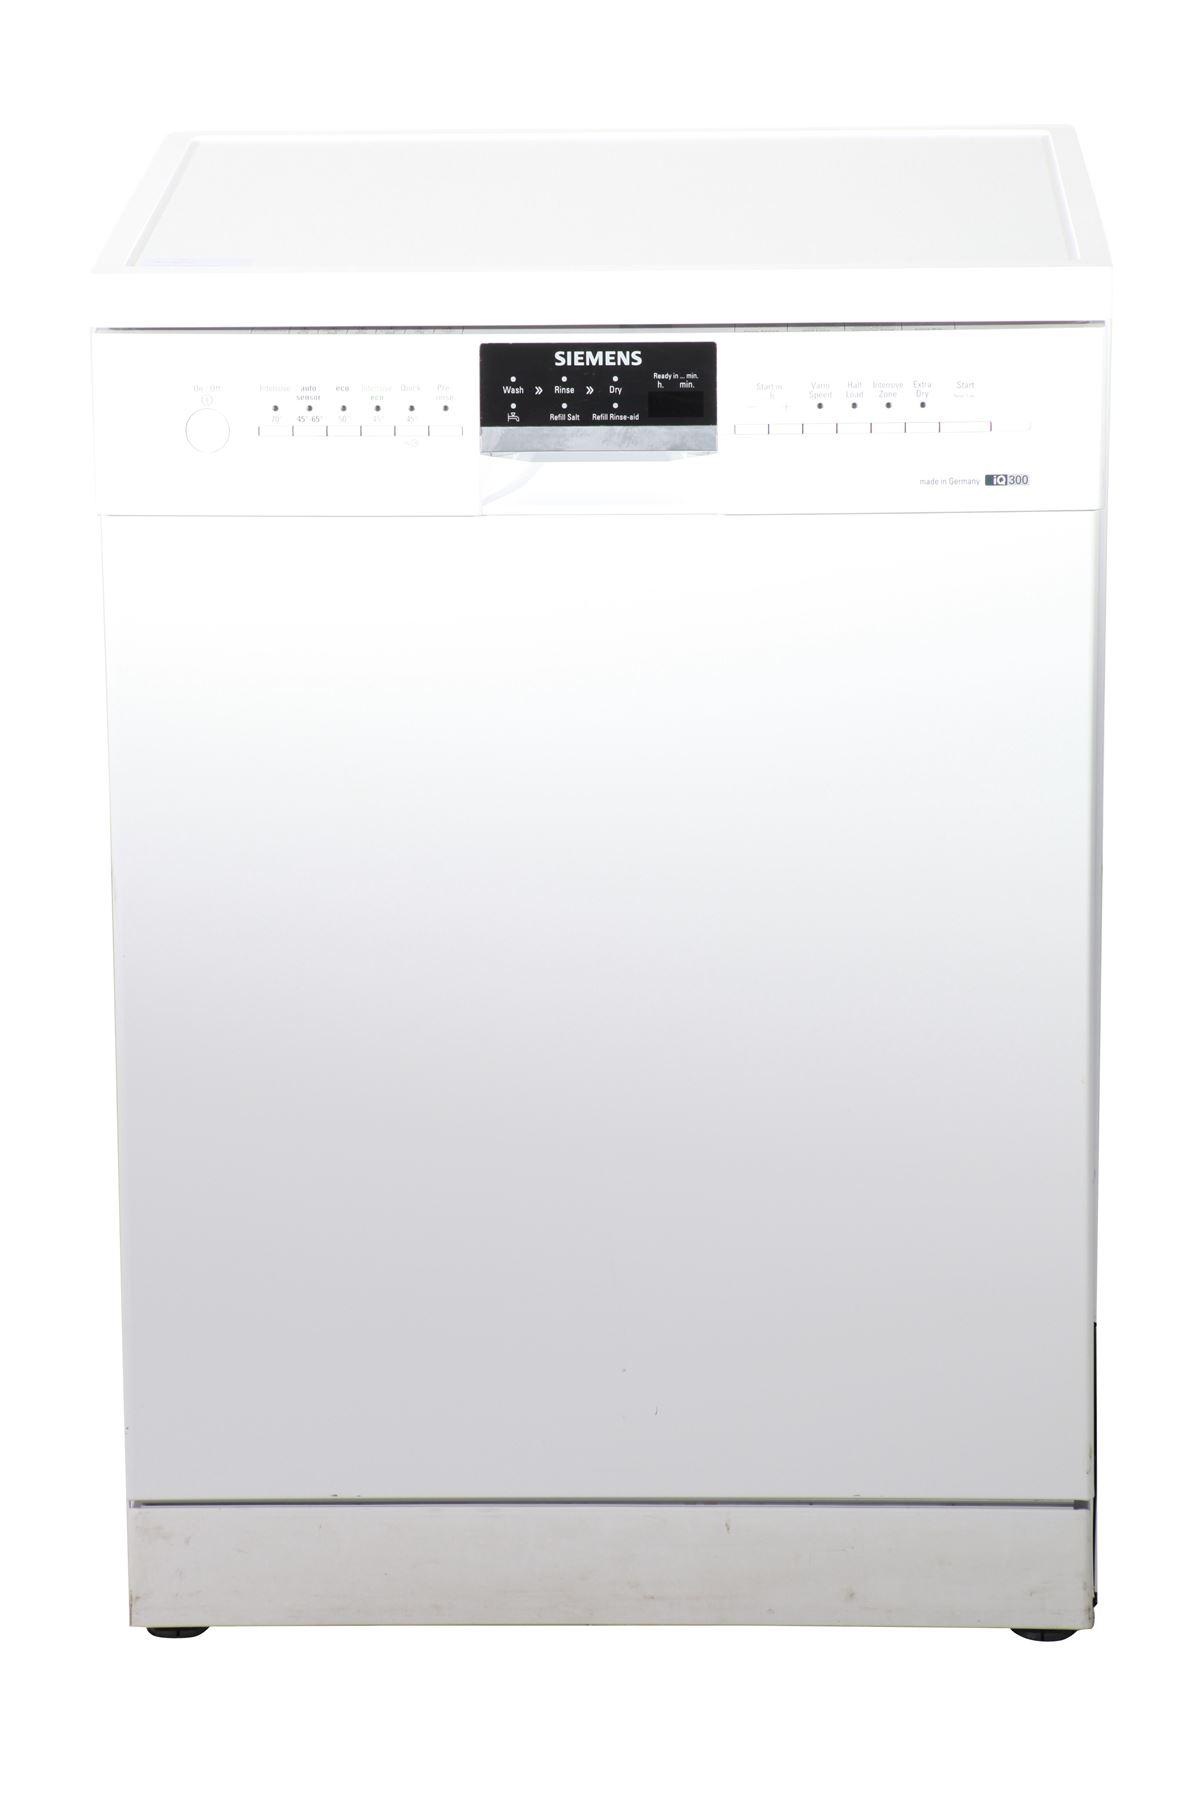 preloved siemens iq 300 dishwasher sn26m253gb white for sale in bromsgrove worcestershire. Black Bedroom Furniture Sets. Home Design Ideas